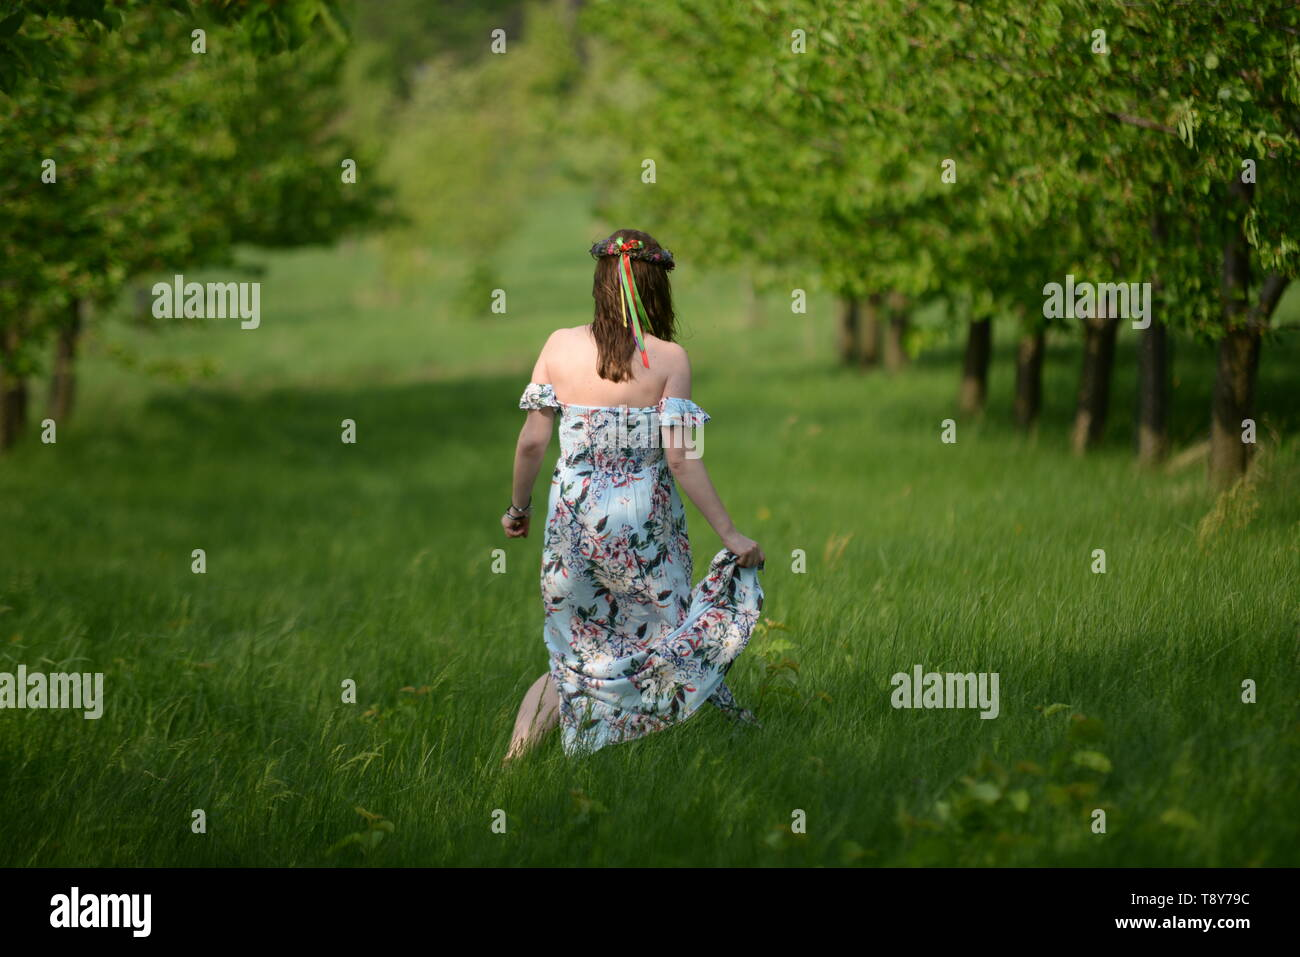 Slavic woman in a fruit garden - Stock Image